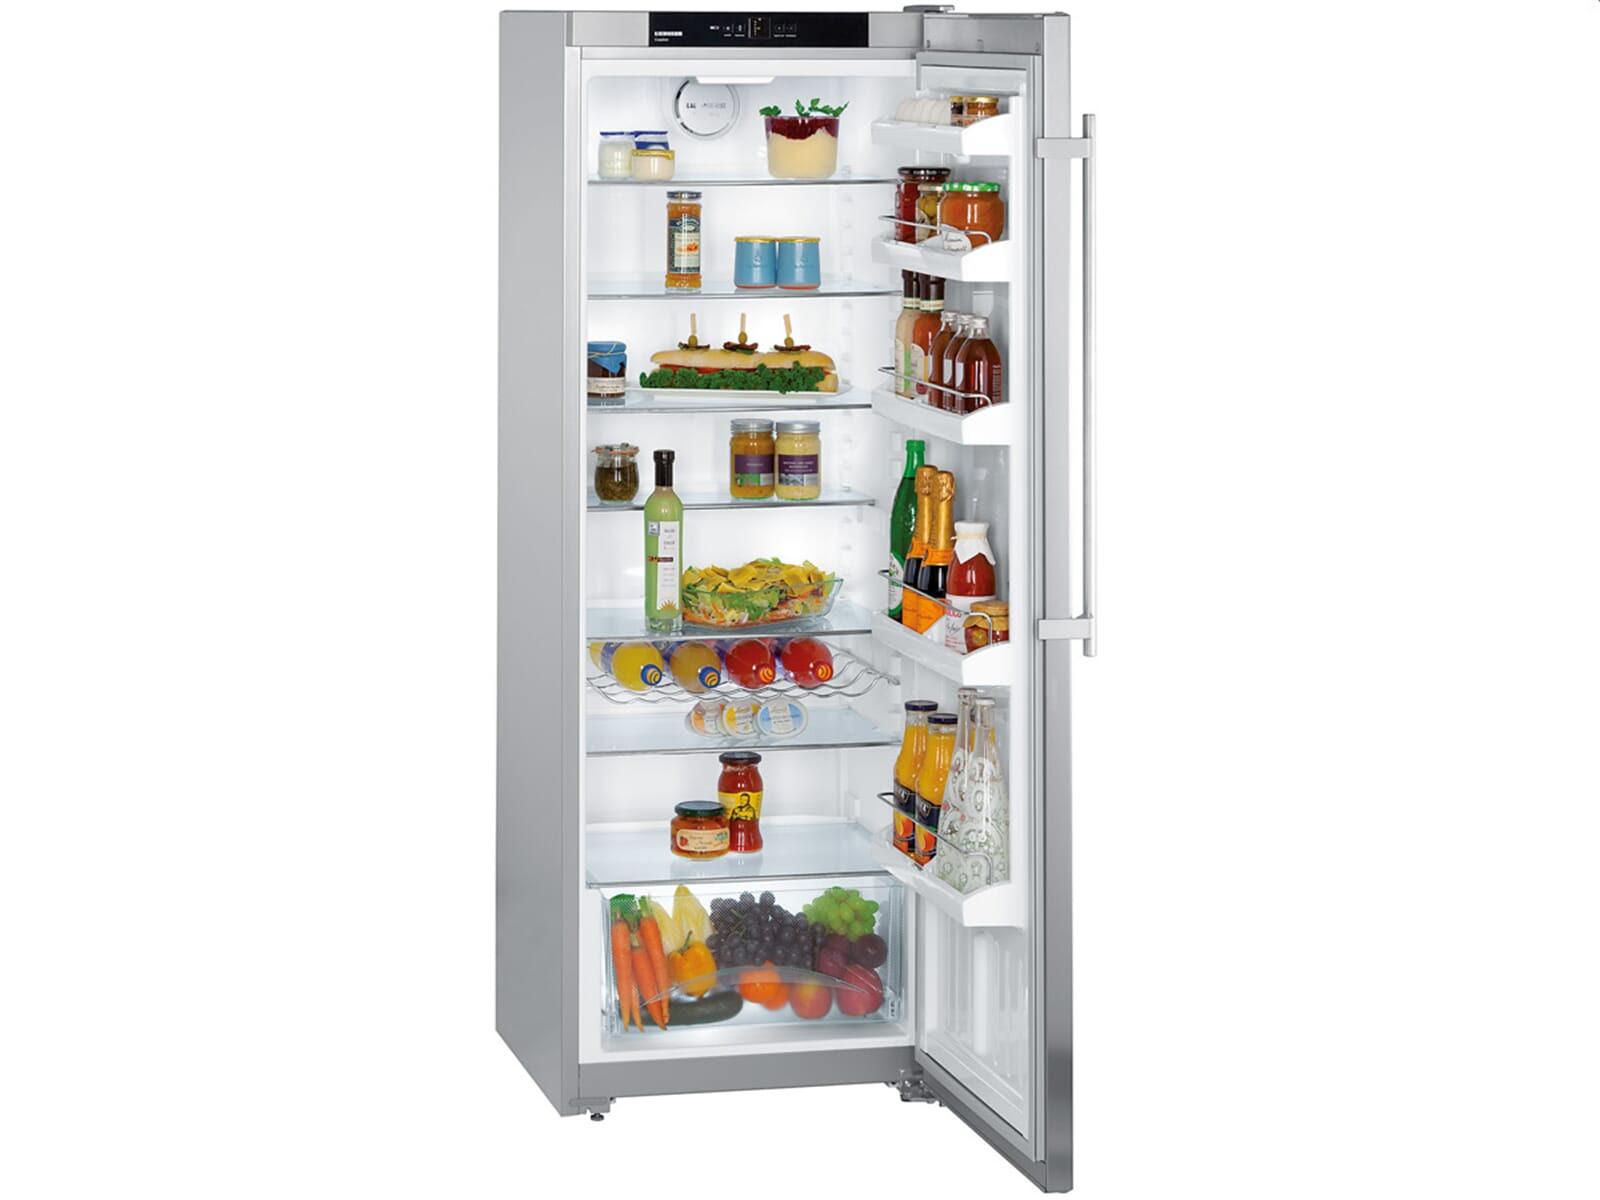 Kühlschrank Party : Liebherr kühlschrank shop charlotte adger